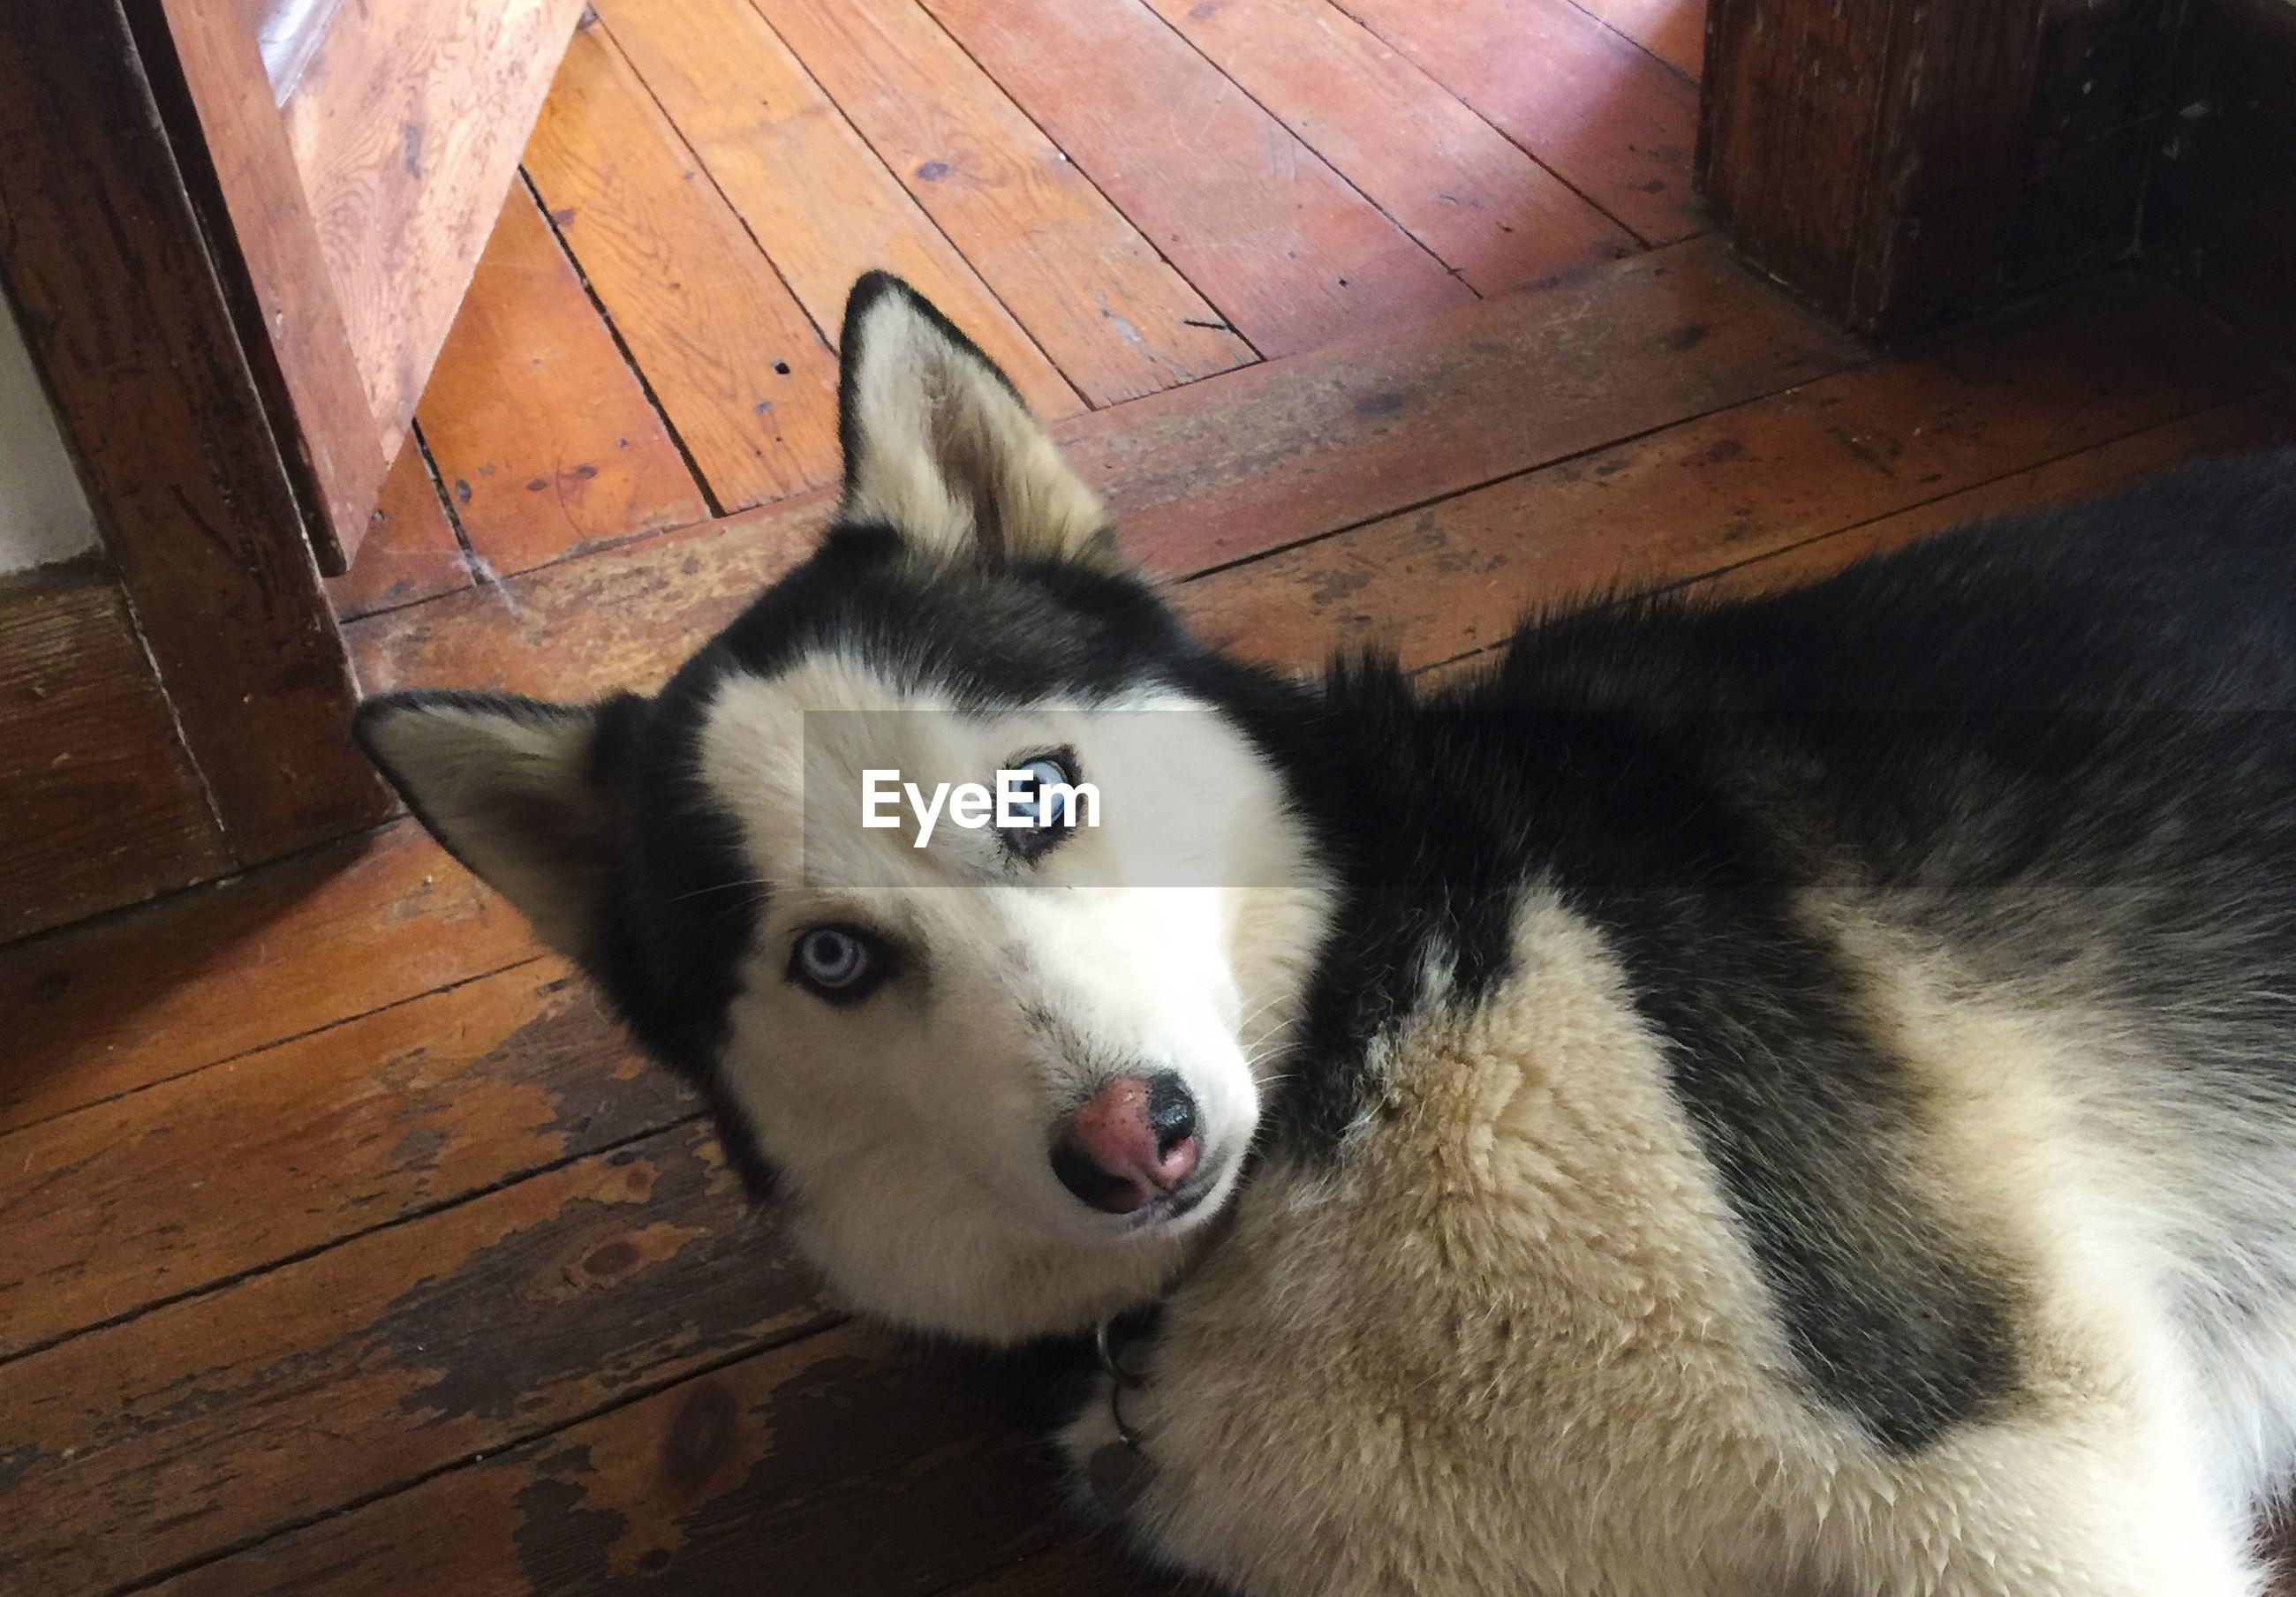 PORTRAIT OF DOG ON HARDWOOD FLOOR